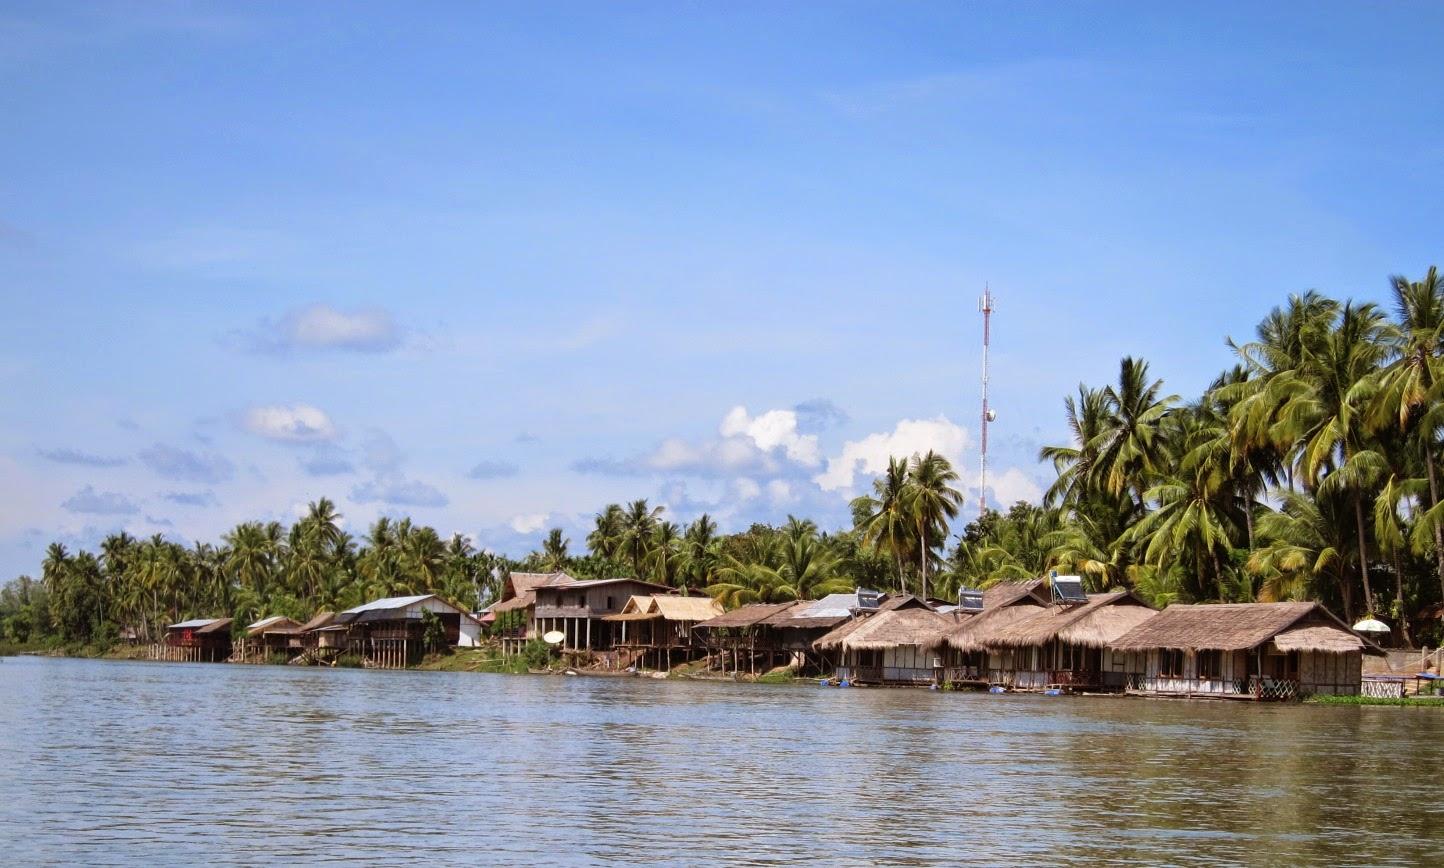 Si Phan Don village